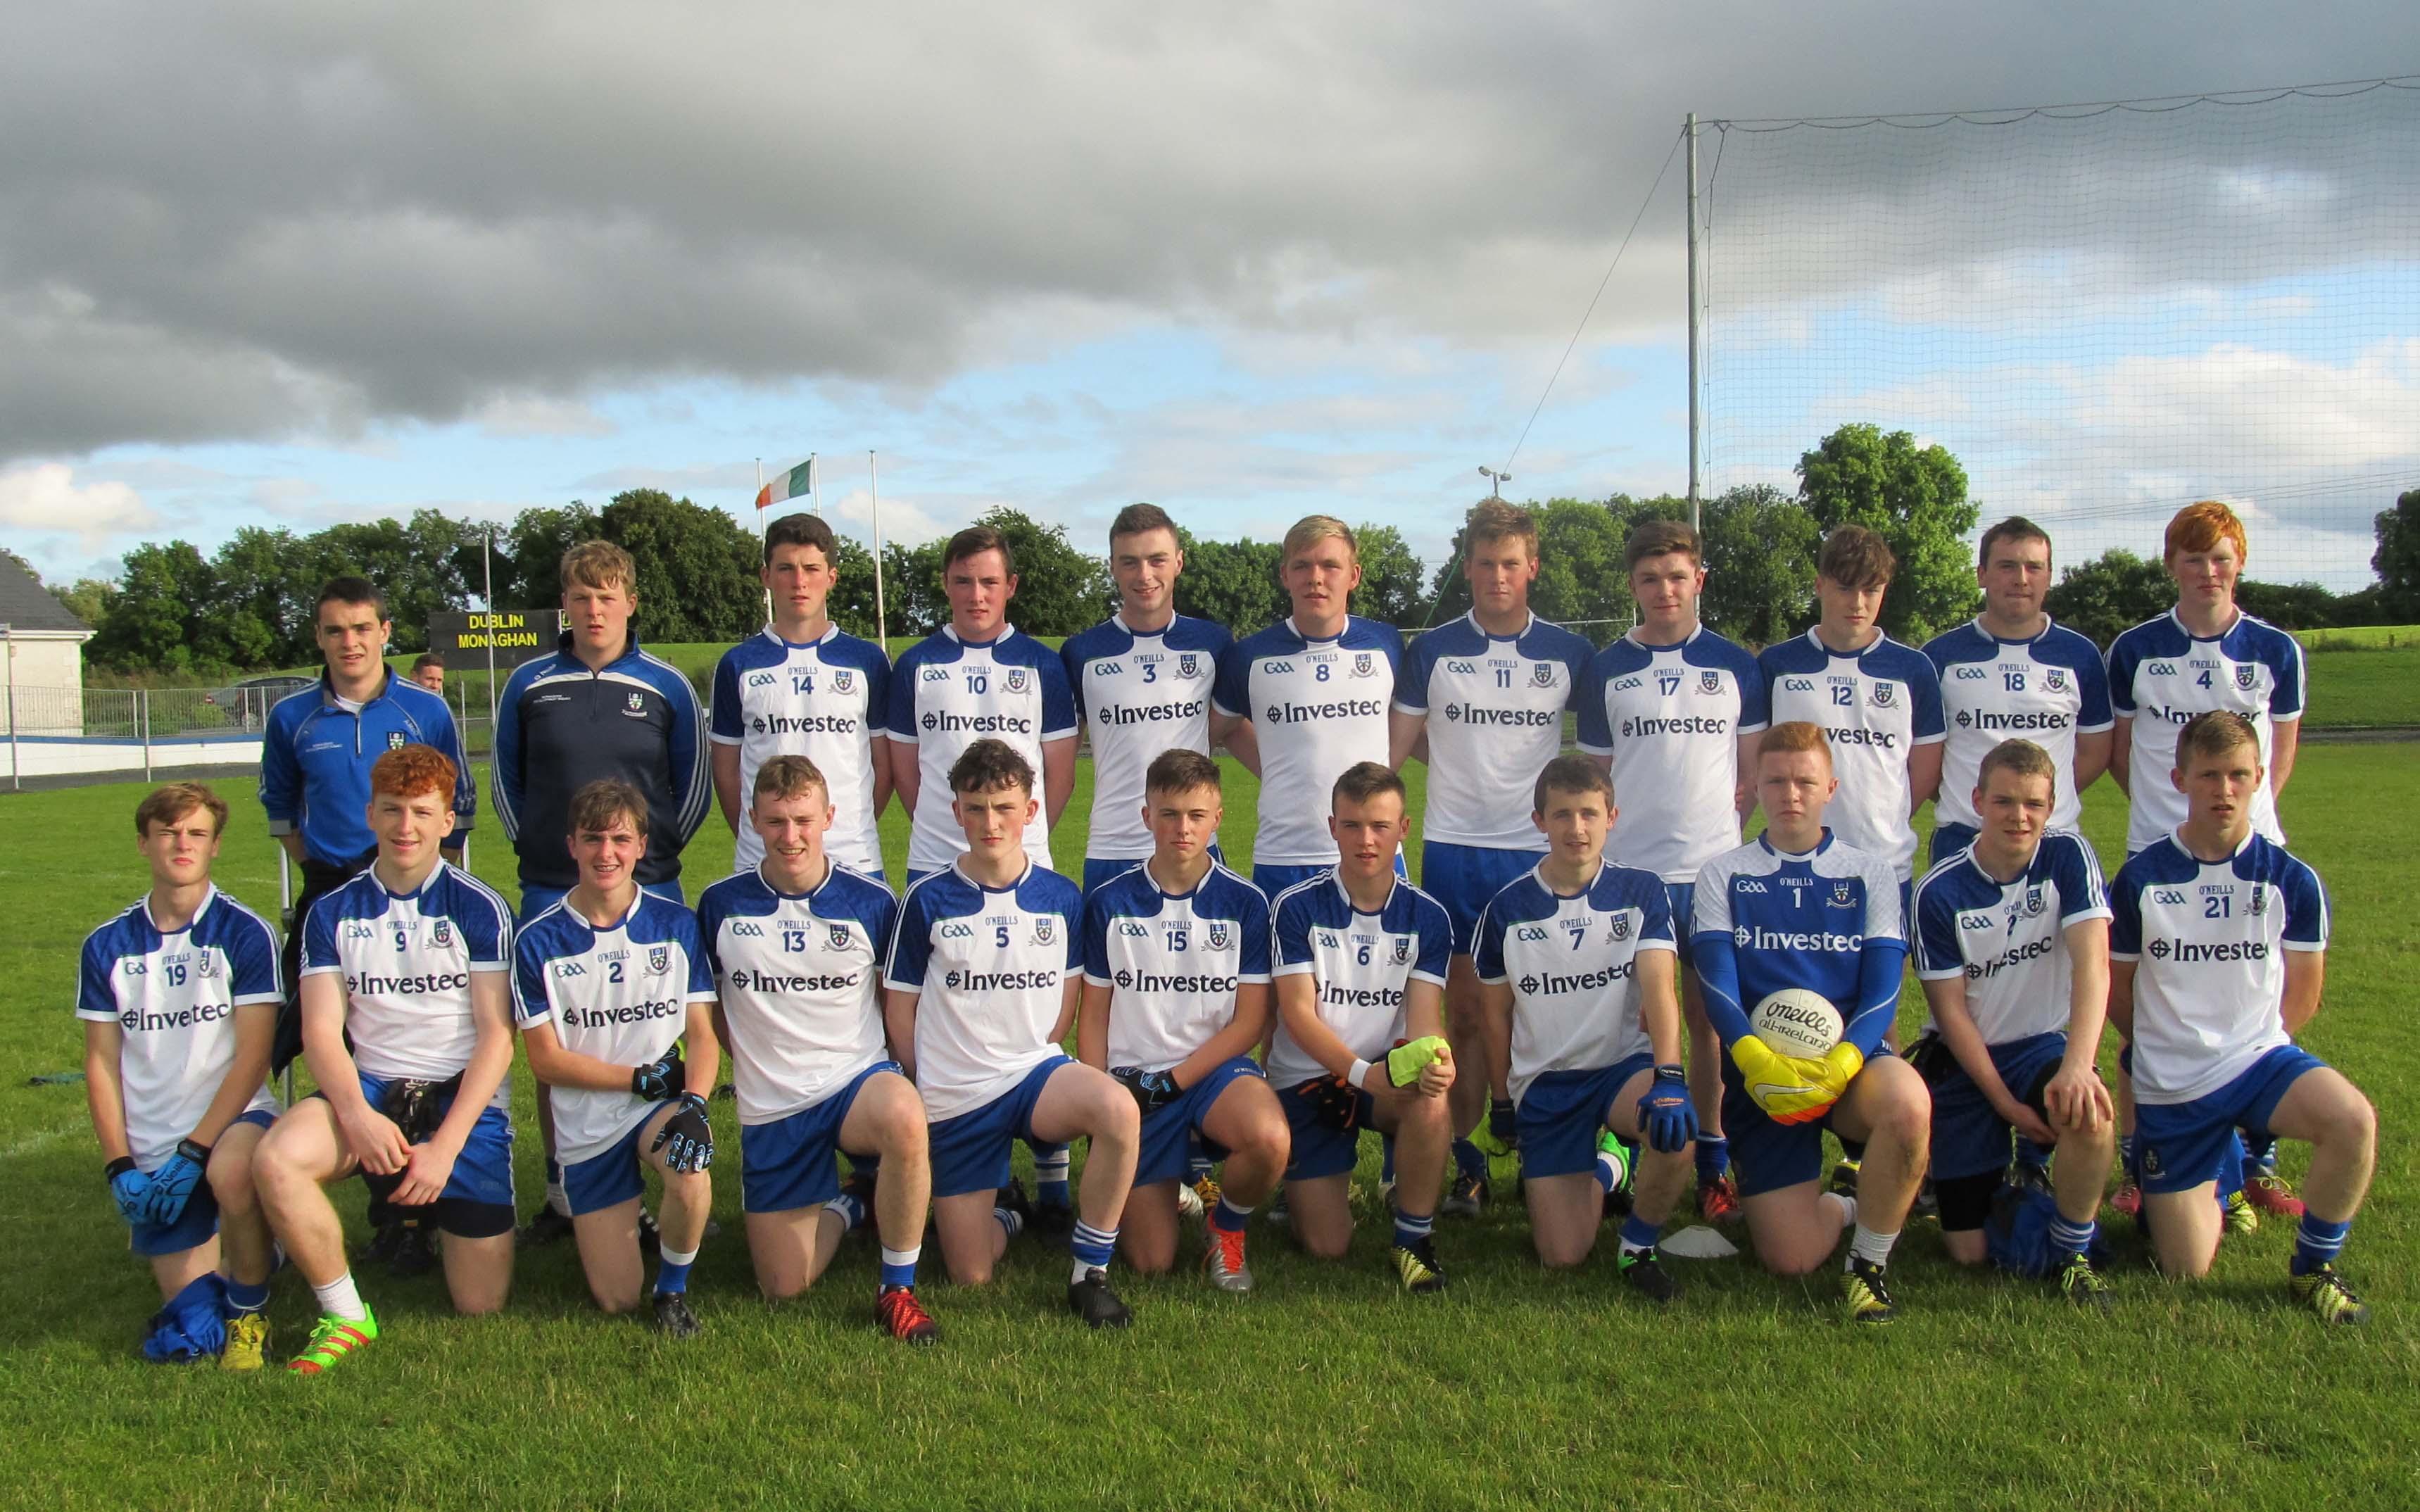 Monaghan U16 Development Squad – Update on Gerry Reilly tournament